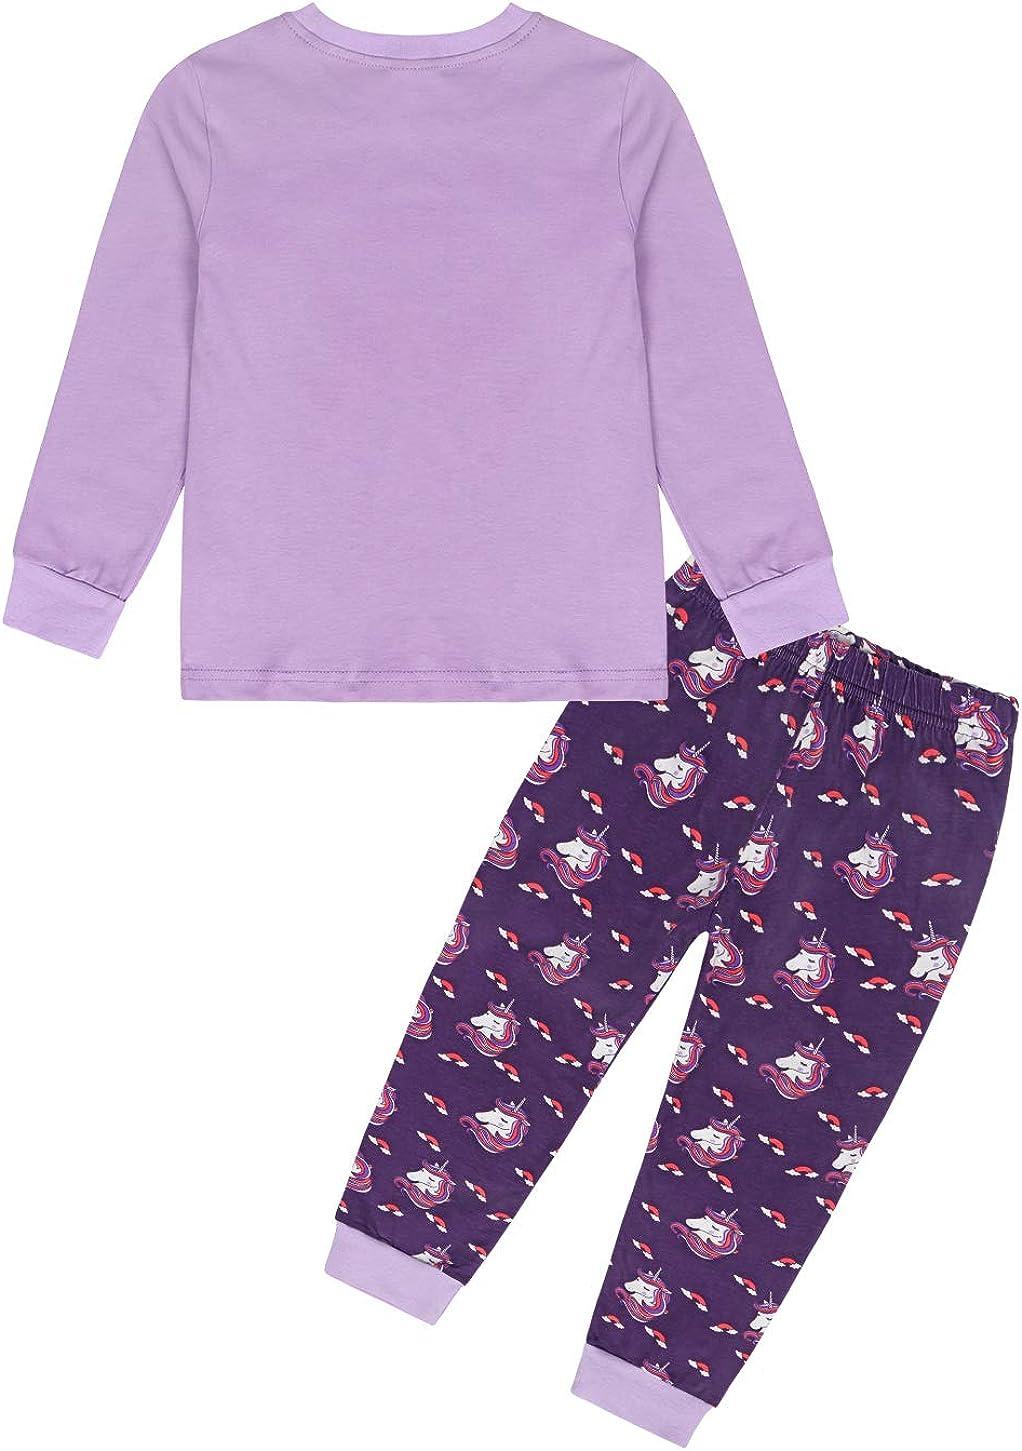 MetCuento Toddler Girls Pajamas Unicorn Children Long Sleeve Little Girl Sleepwear Sets Two Piece Clothes Set